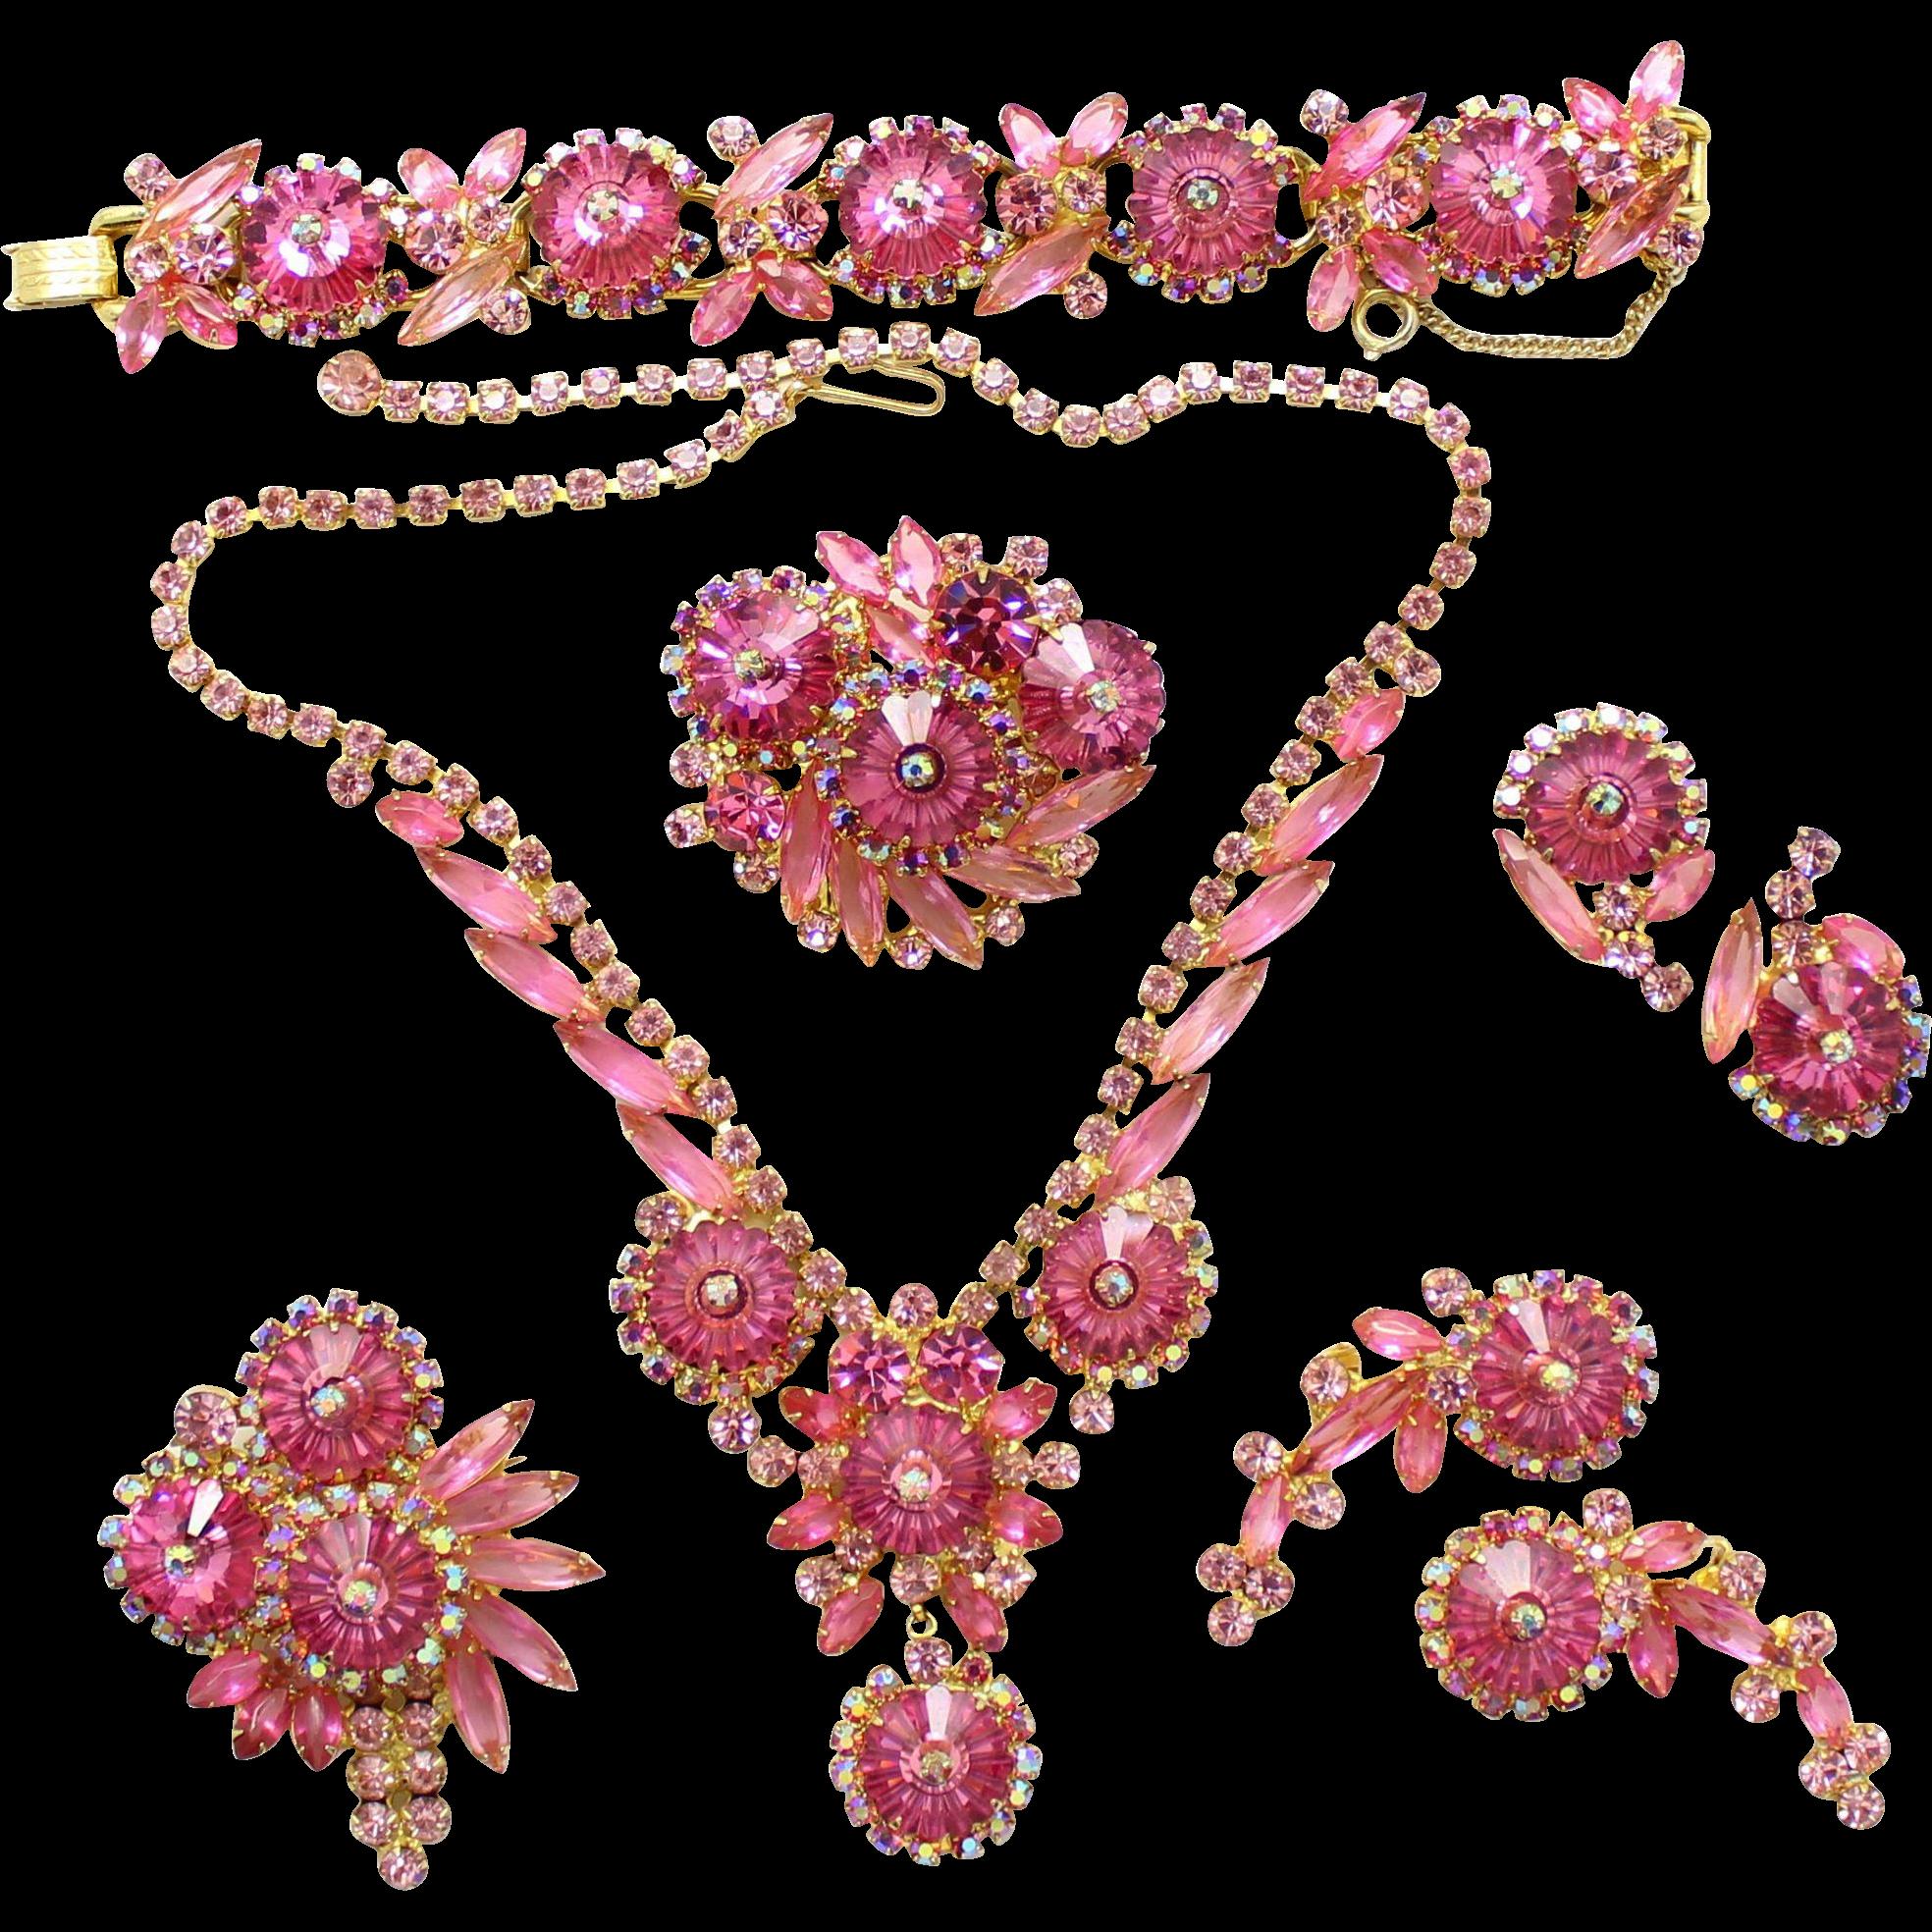 Vintage Juliana Book Piece Pink Margarita Rivoli Rhinestone Necklace, Bracelet, 2 Brooches and 2 pair Earrings Grand Parure